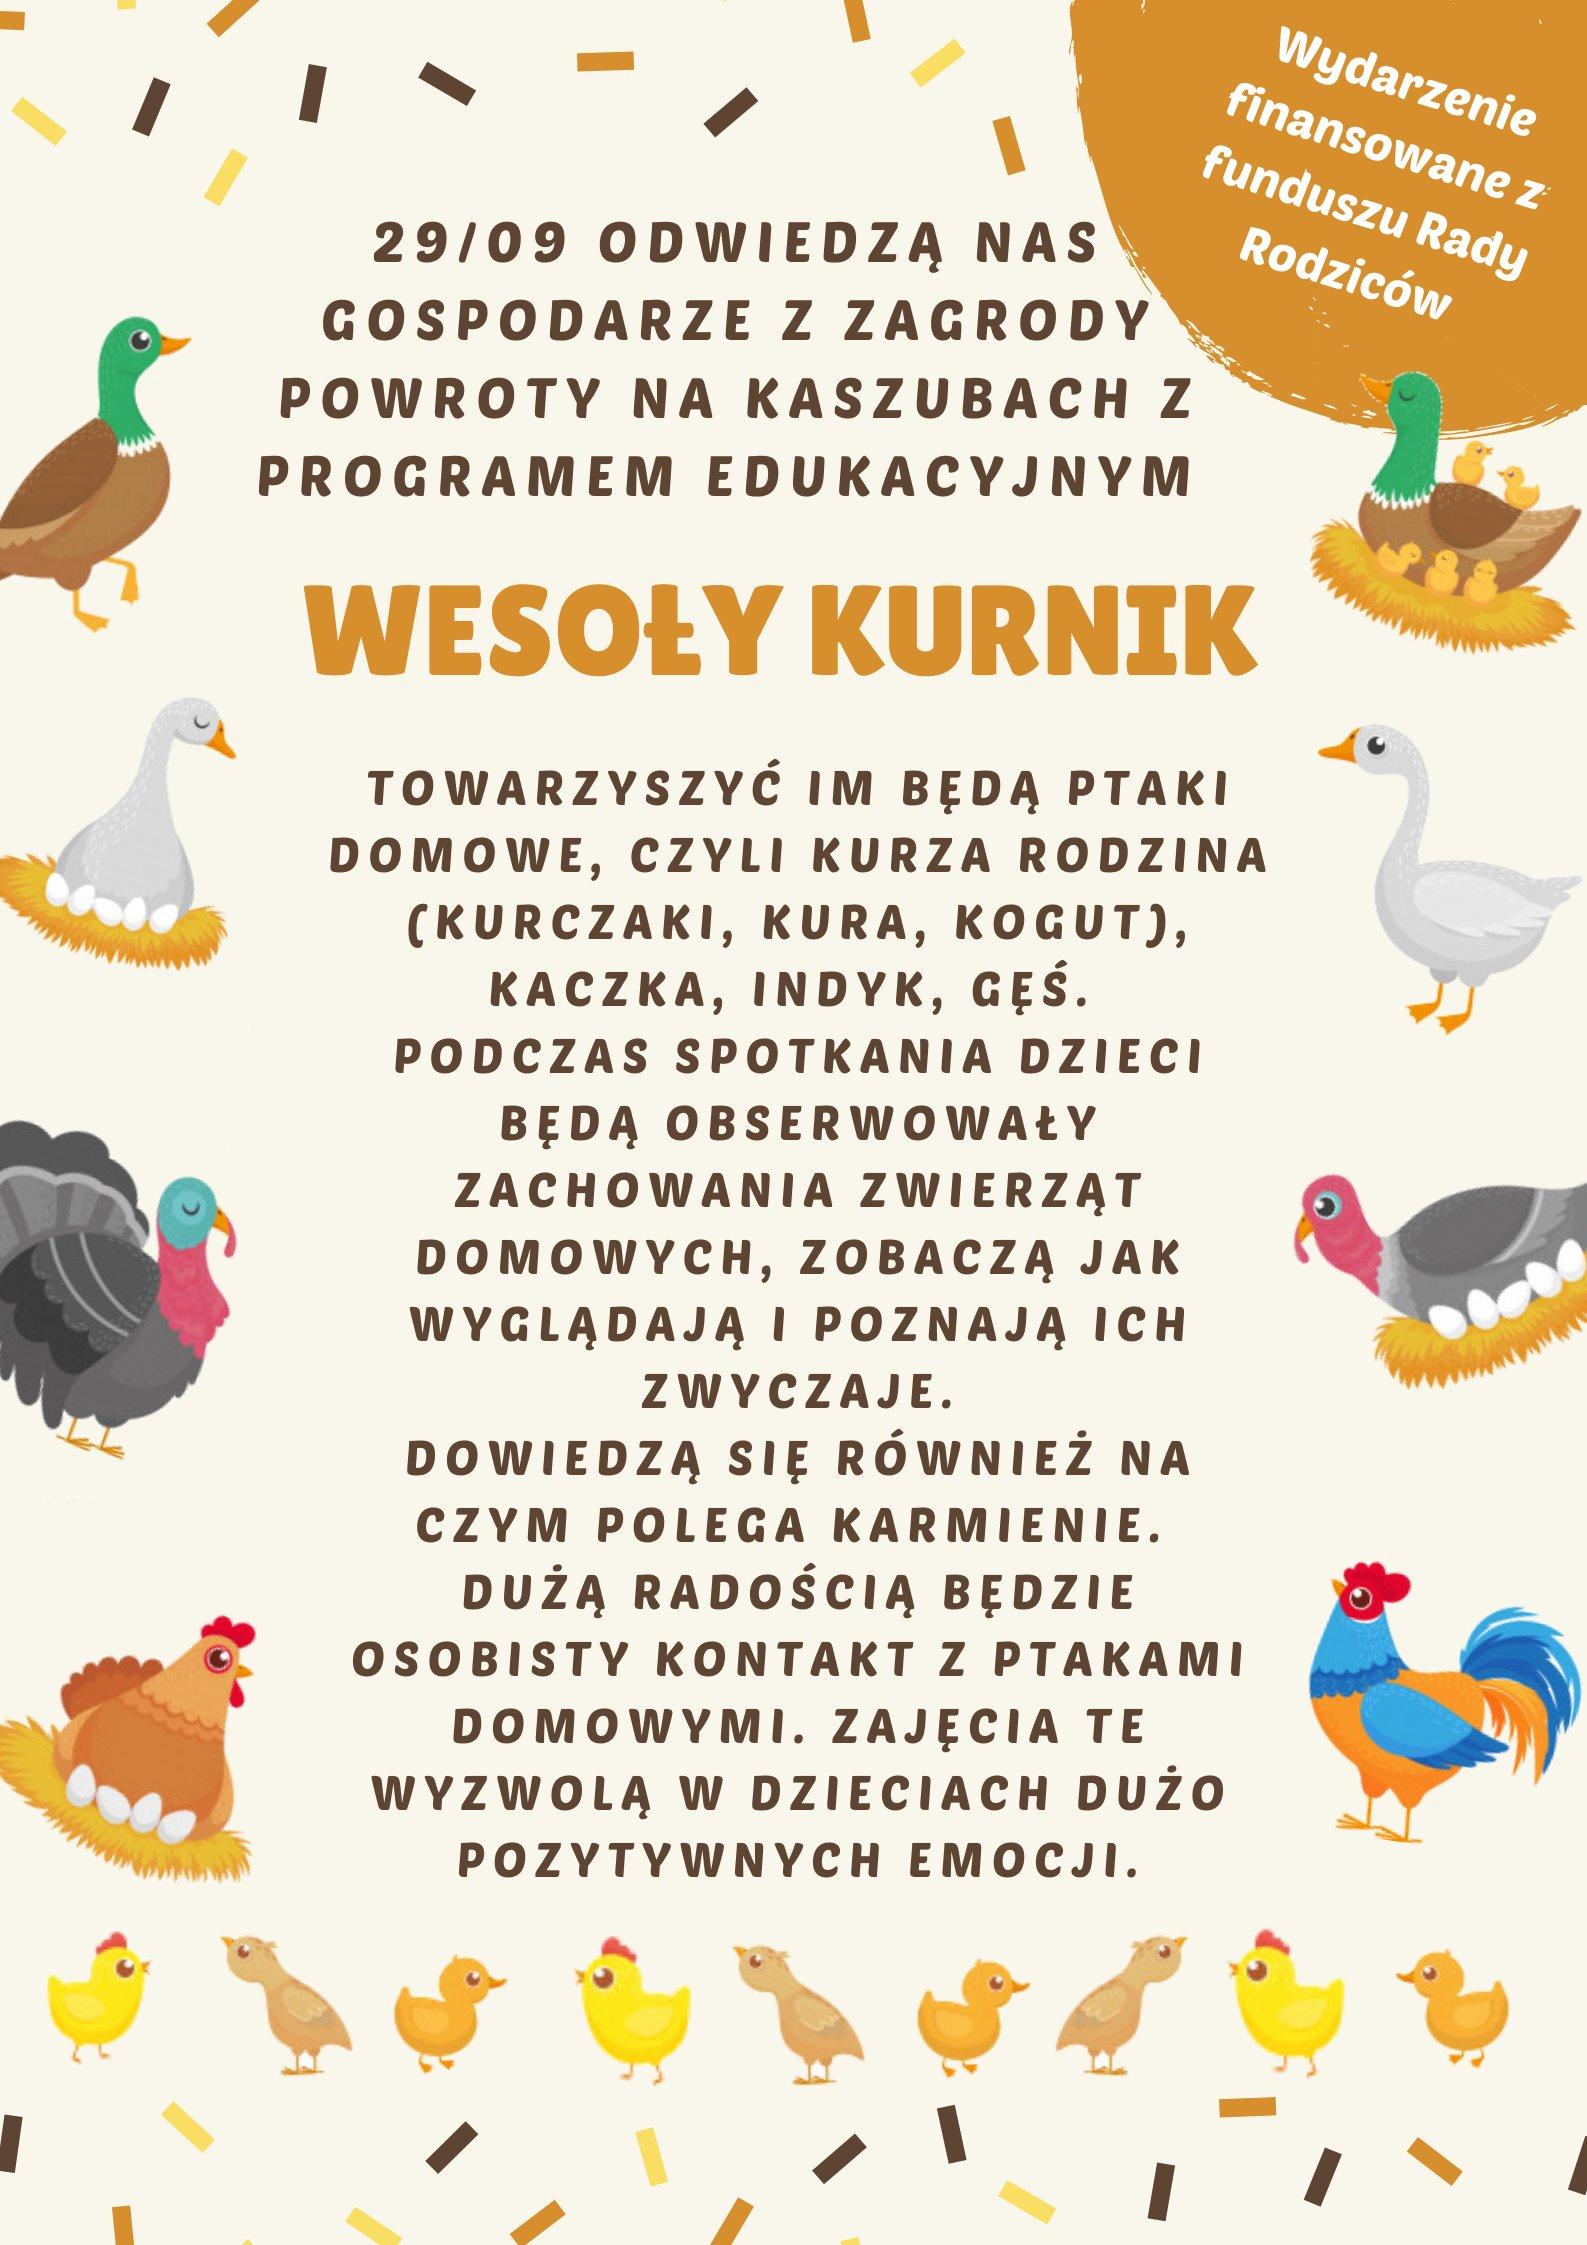 wesoly kurnik.png